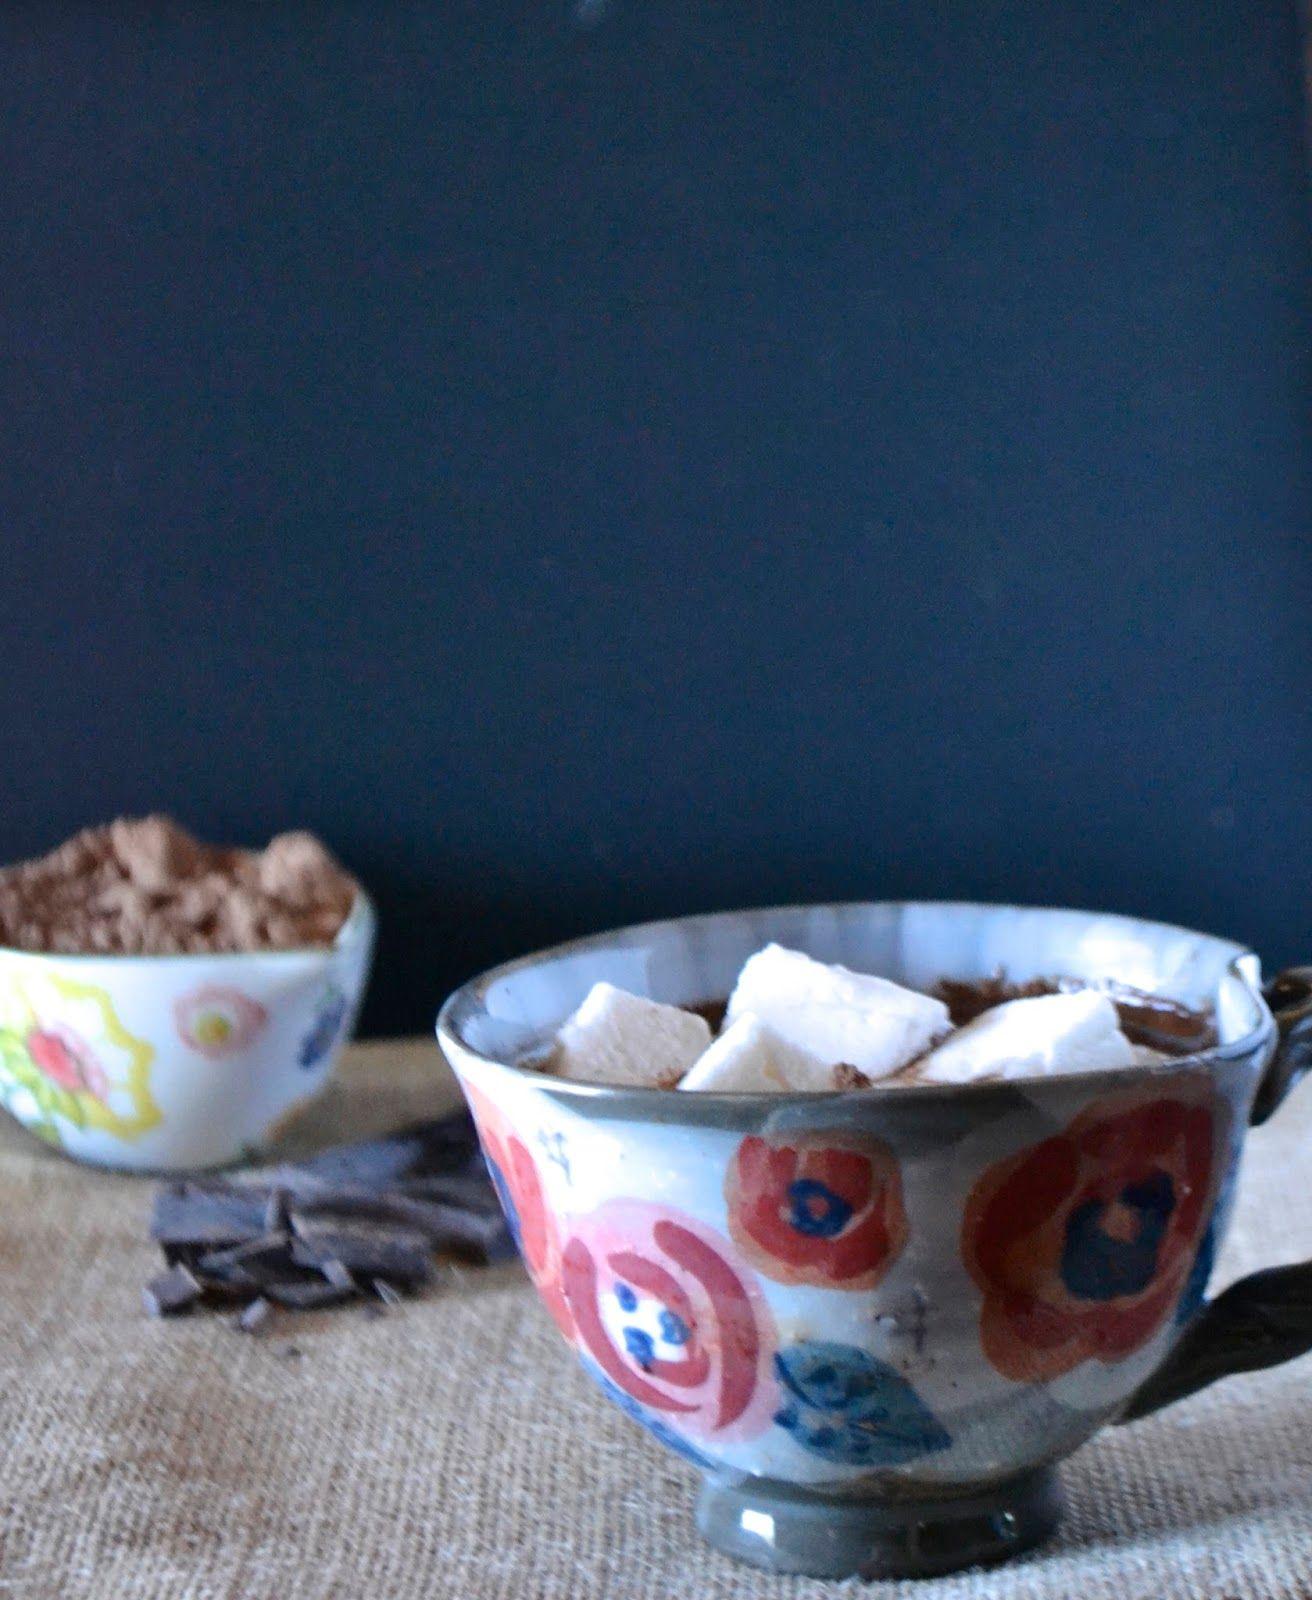 Paleo Crumbs: Creamy Hot Cocoa (dairy free)